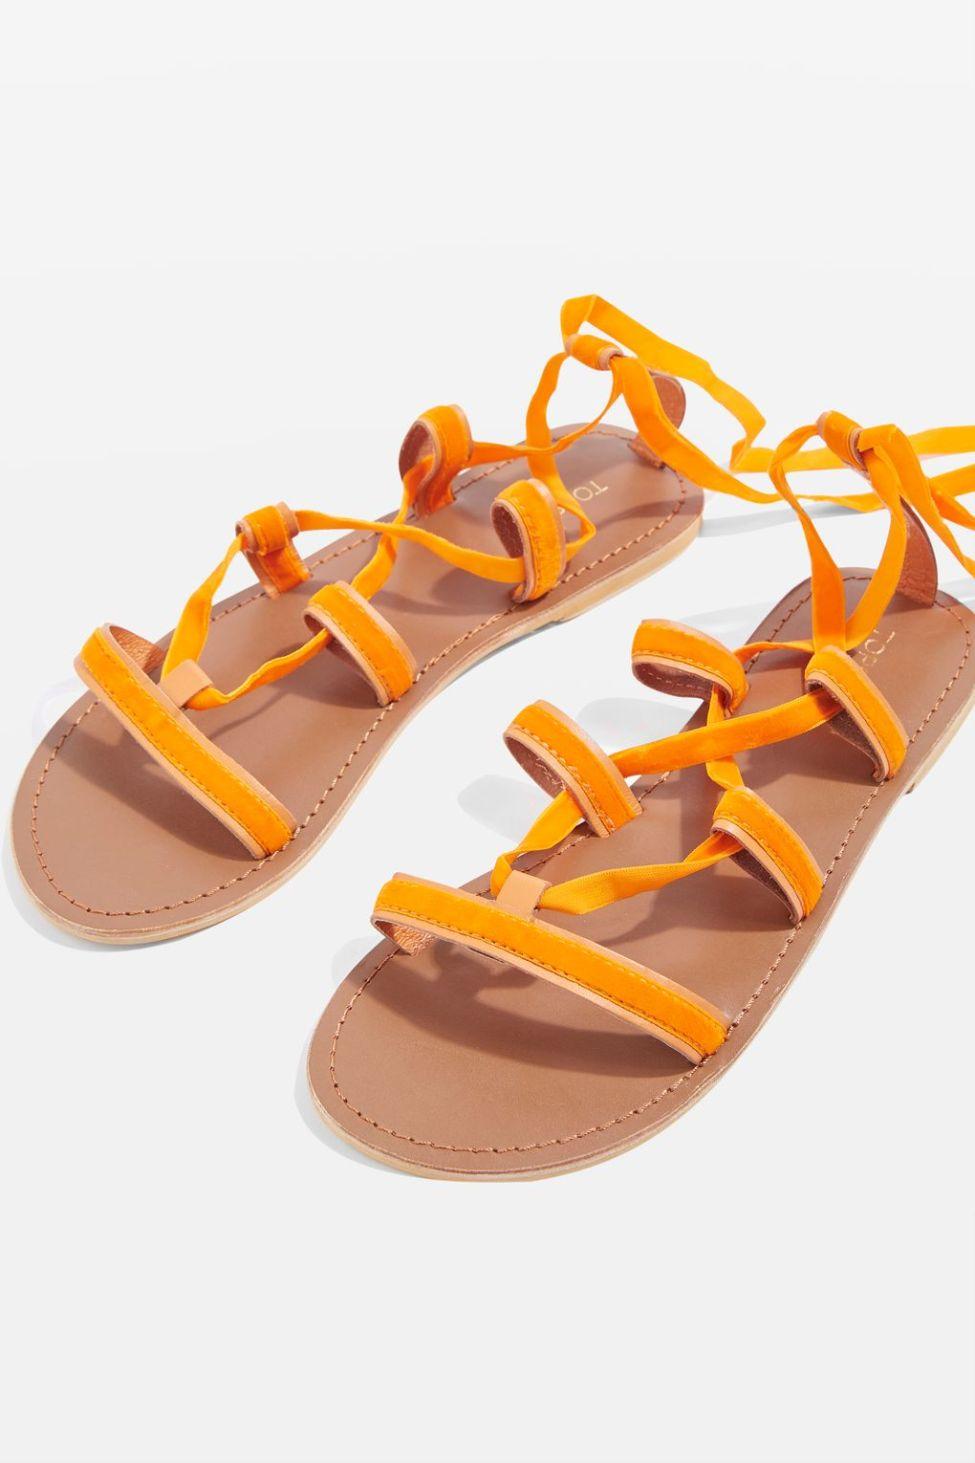 Topshop velvet sandals